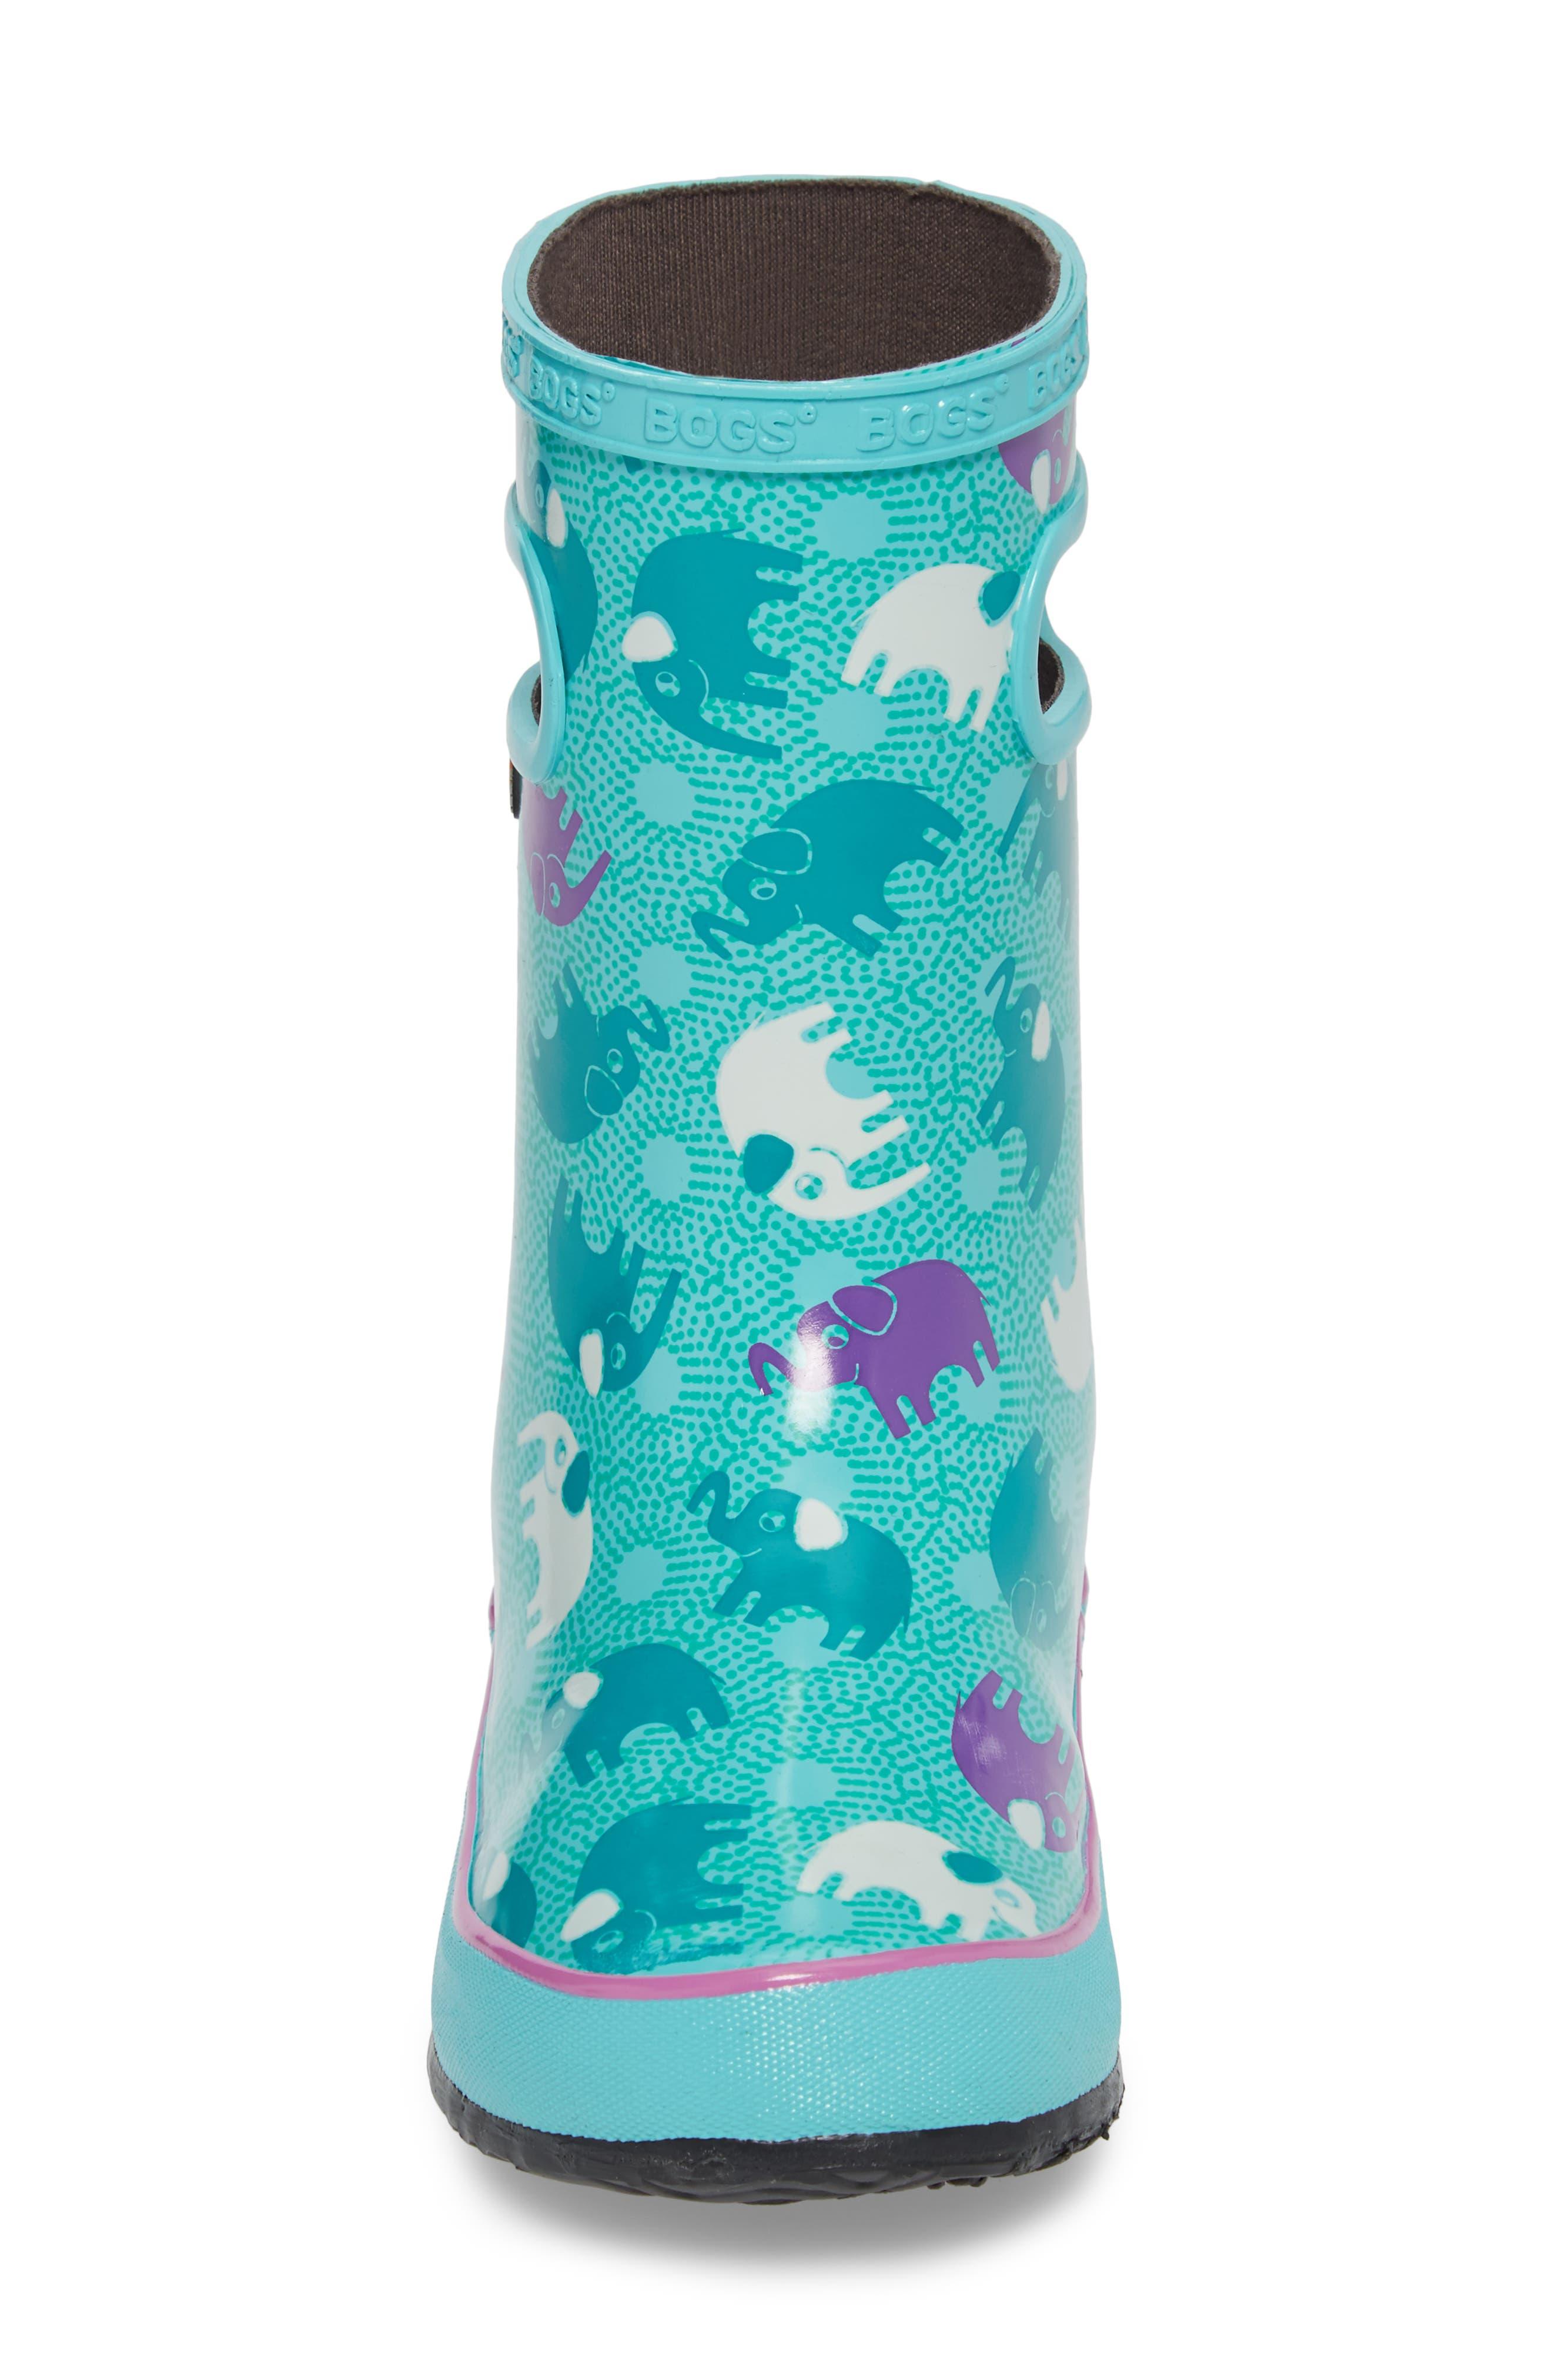 BOGS, Skipper Elephant Print Rubber Waterproof Rain Boot, Alternate thumbnail 4, color, TURQUOISE MULTI